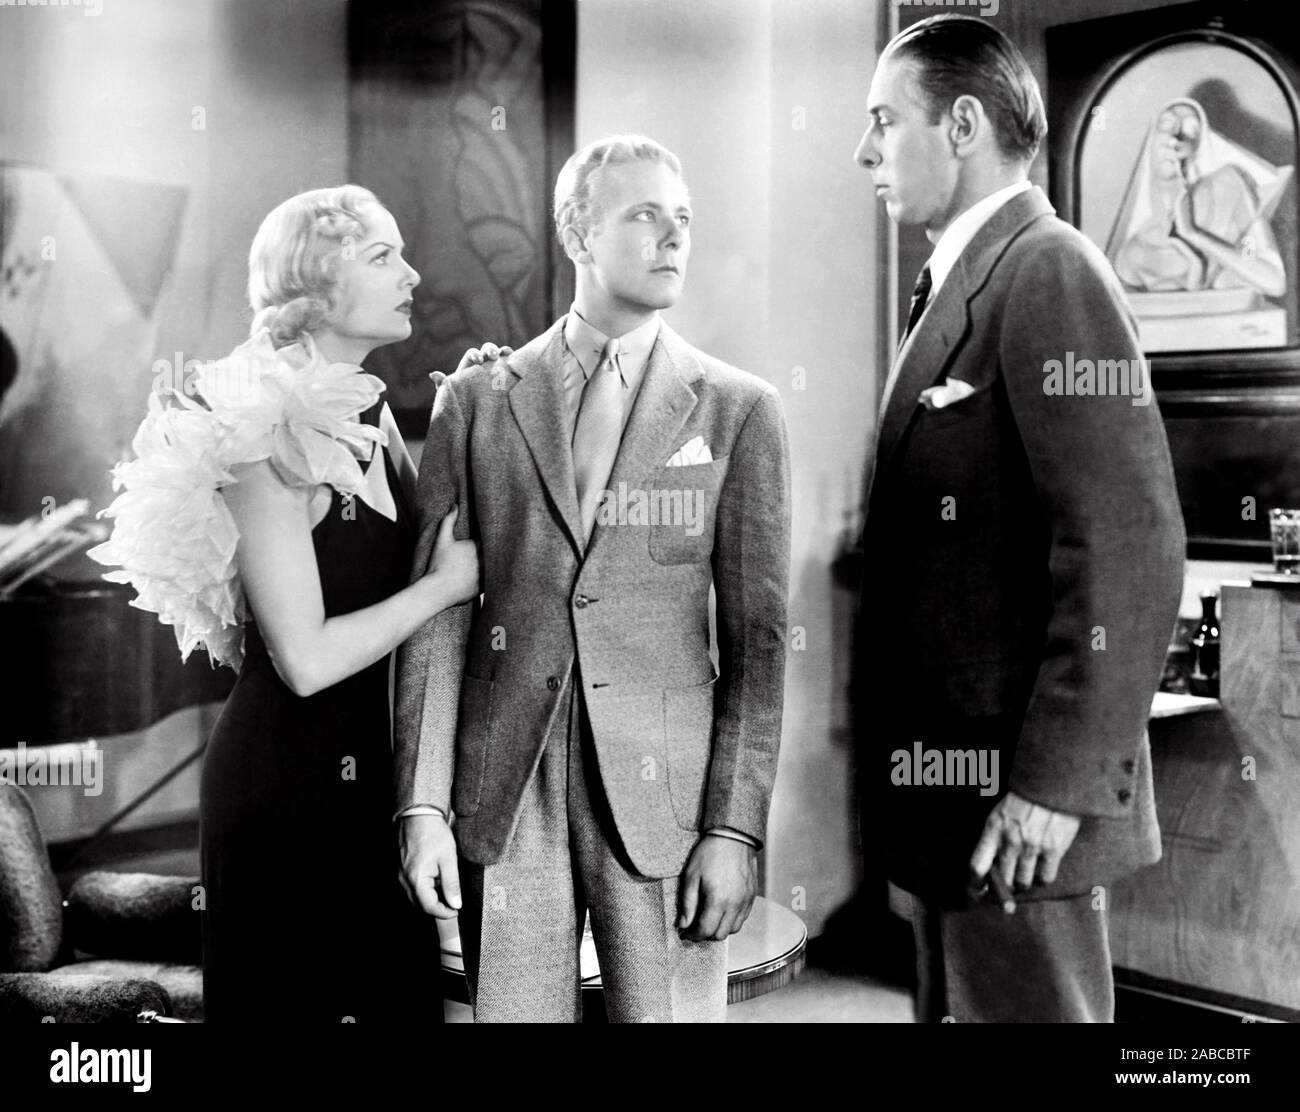 Bref moment, de gauche, Carole Lombard, Gene Raymond, Arthur Hohl, 1933 Banque D'Images